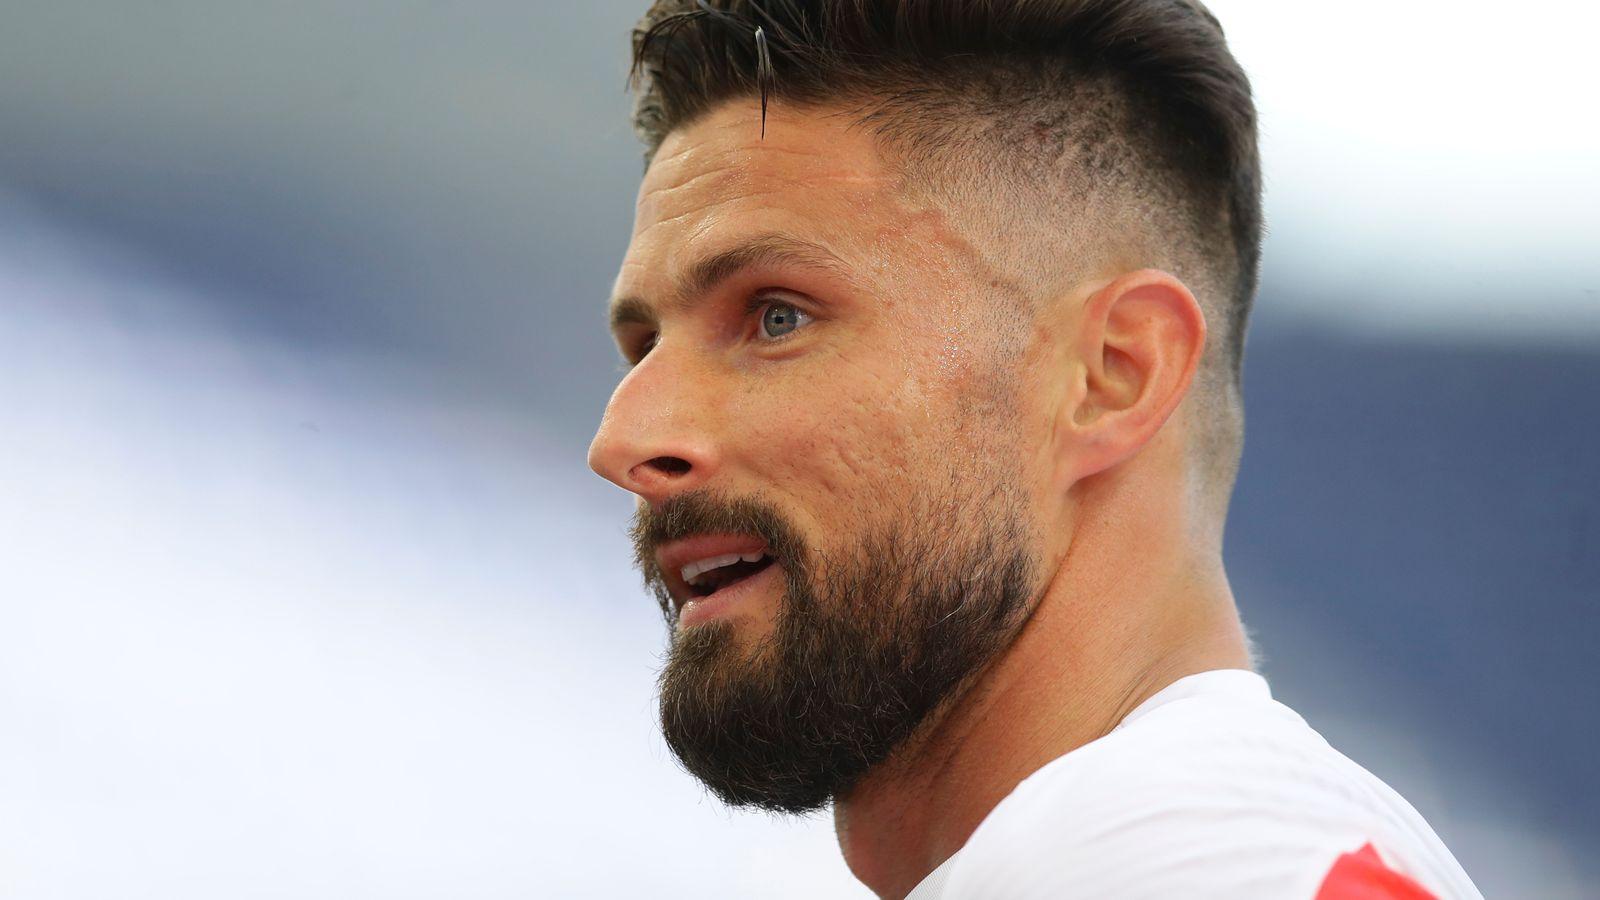 Giroud undergoing AC Milan medical ahead two-year deal